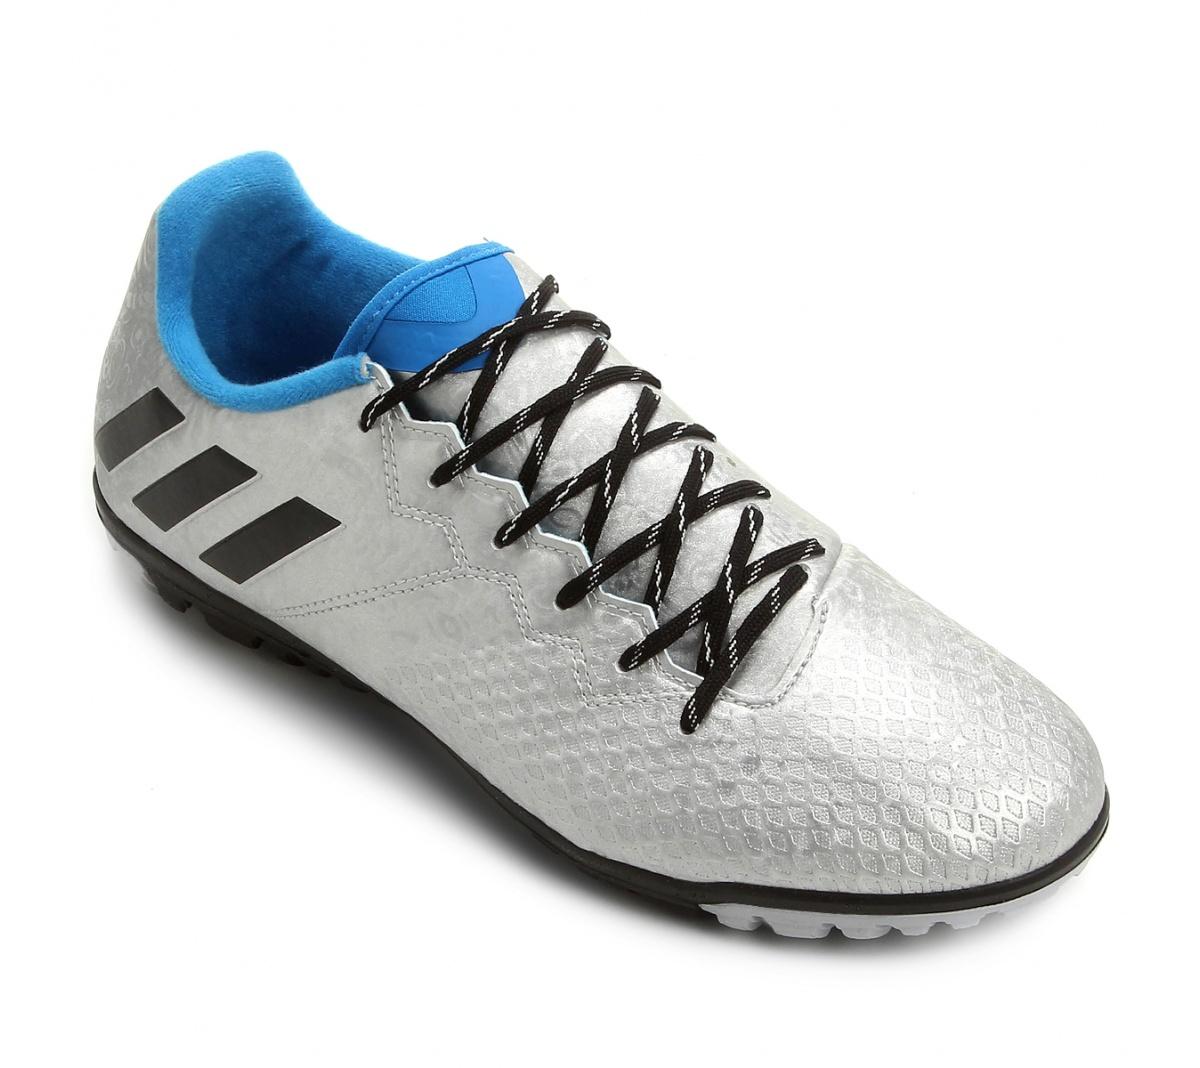 Chuteira Adidas Messi 16.3 Society Cz Az - Mundo do Futebol 2fb33dff34379